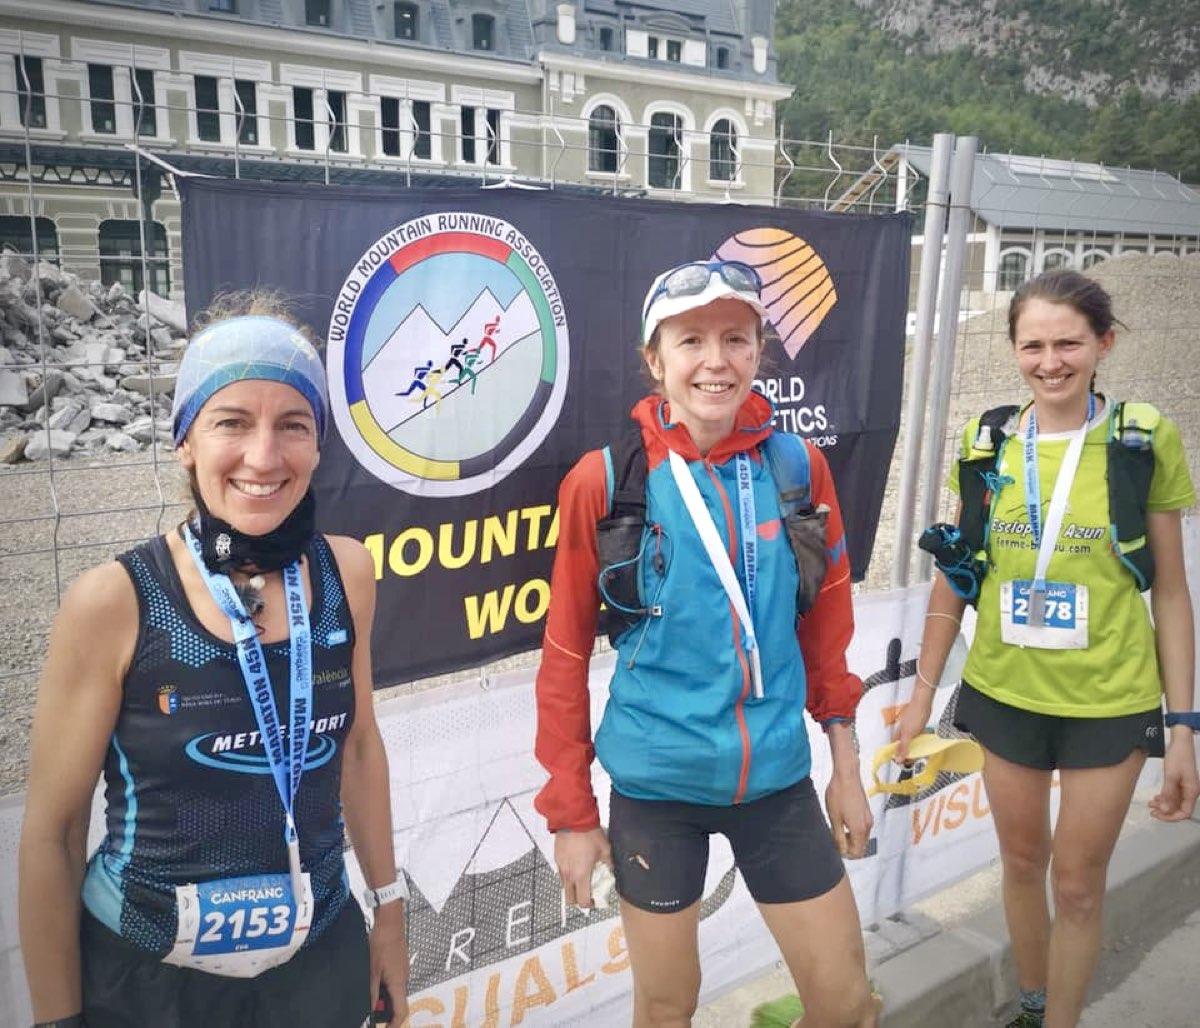 2021 Canfranc 45k womens podium